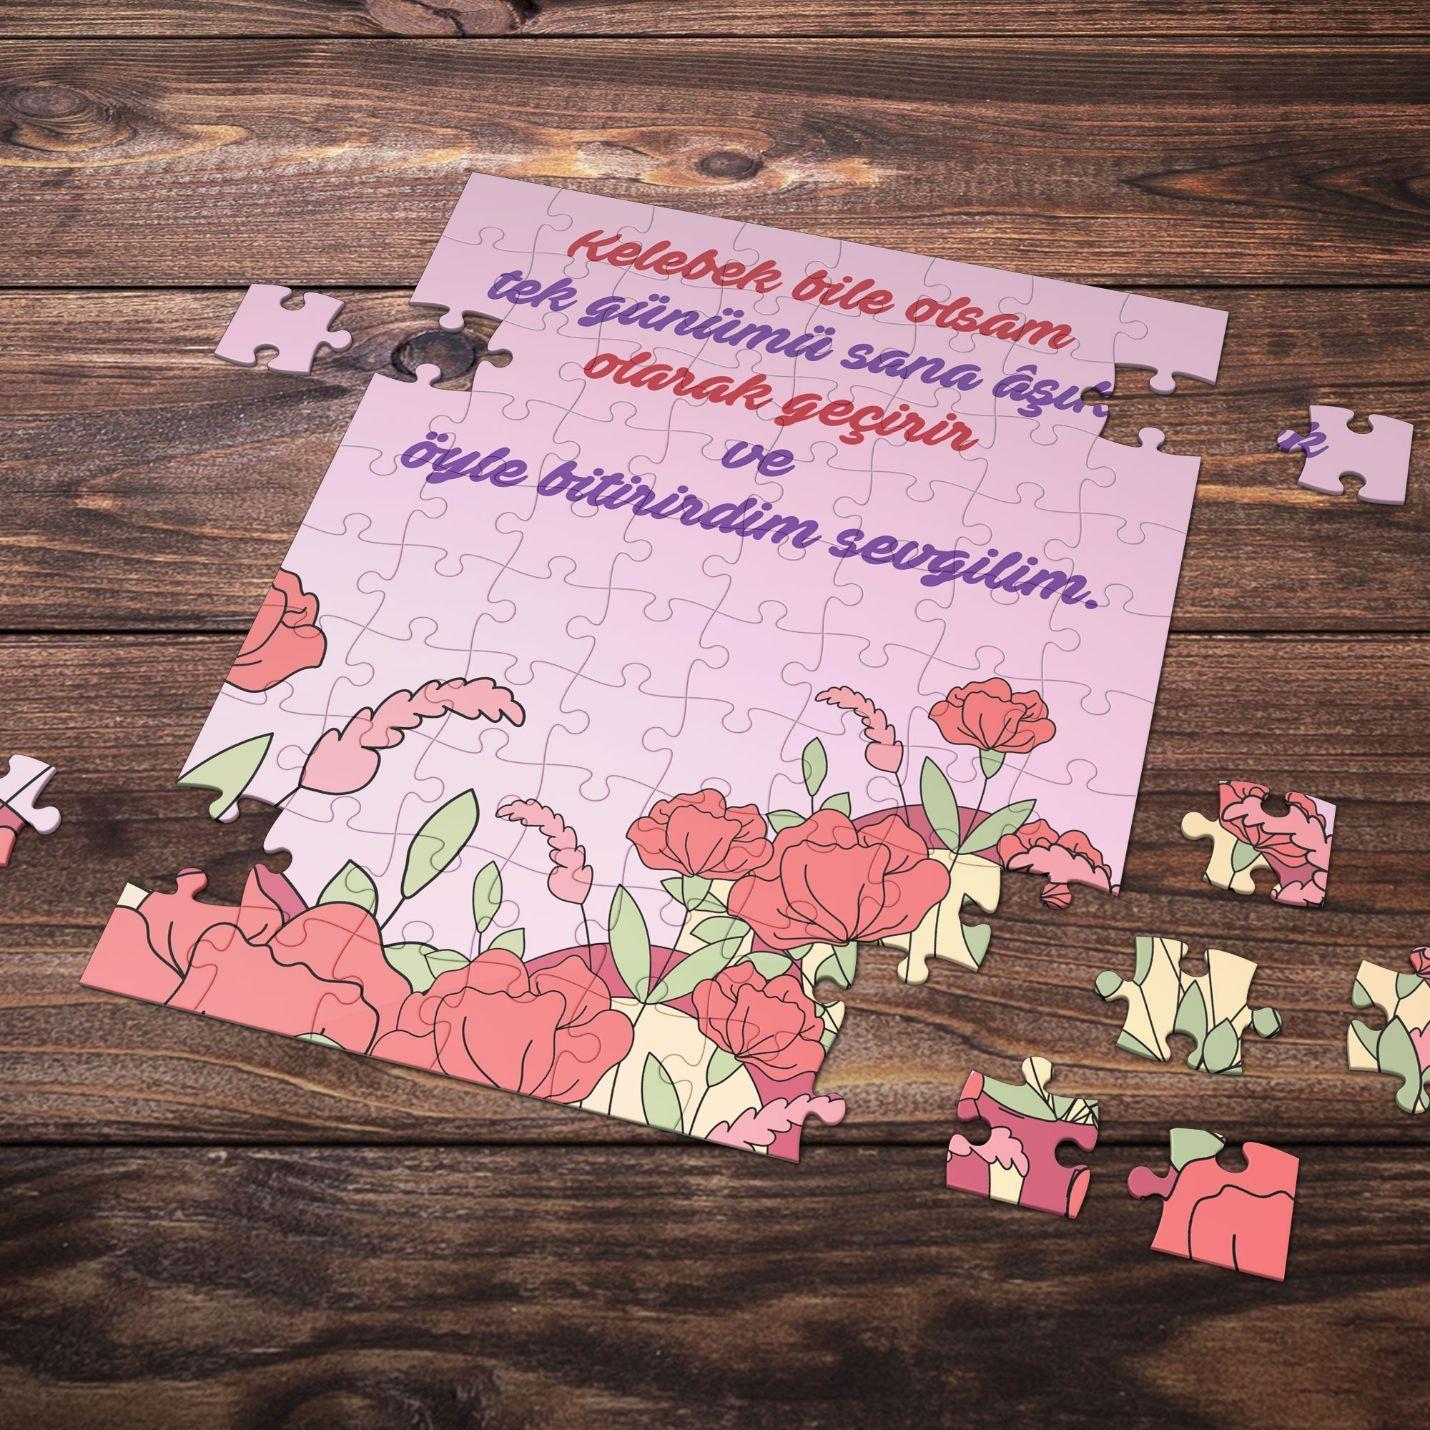 99 Parça Romantik Tasarımlı Puzzle Yapboz No1